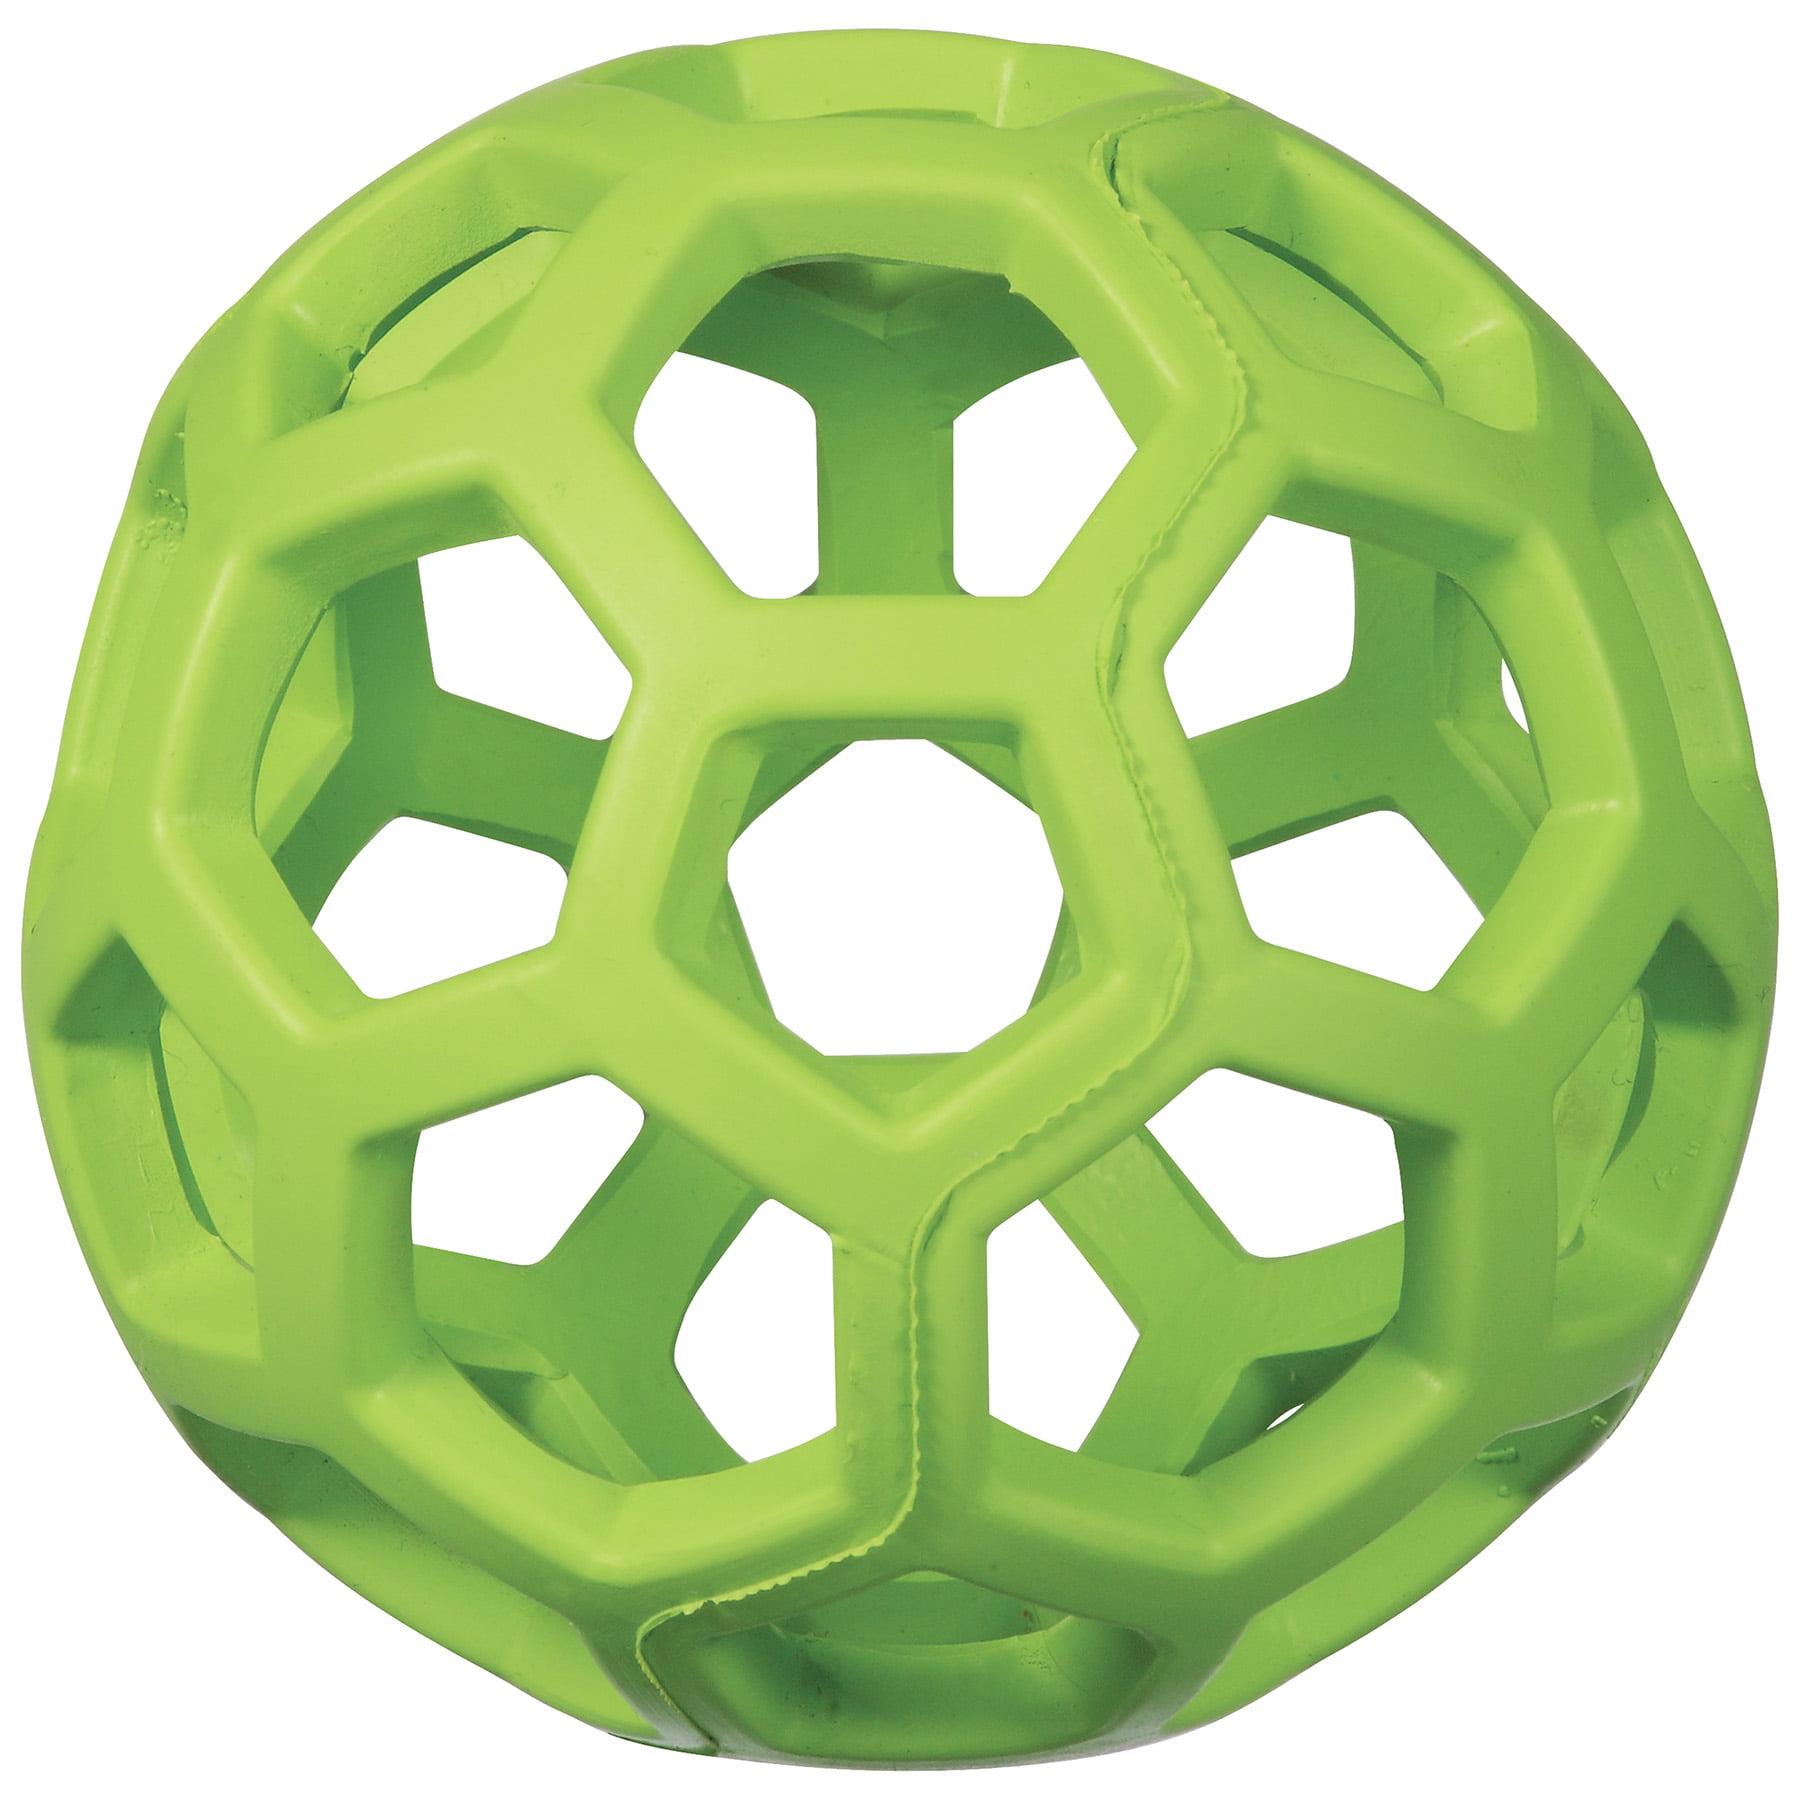 Jw Hol-Ee Roller Dog ball, Small